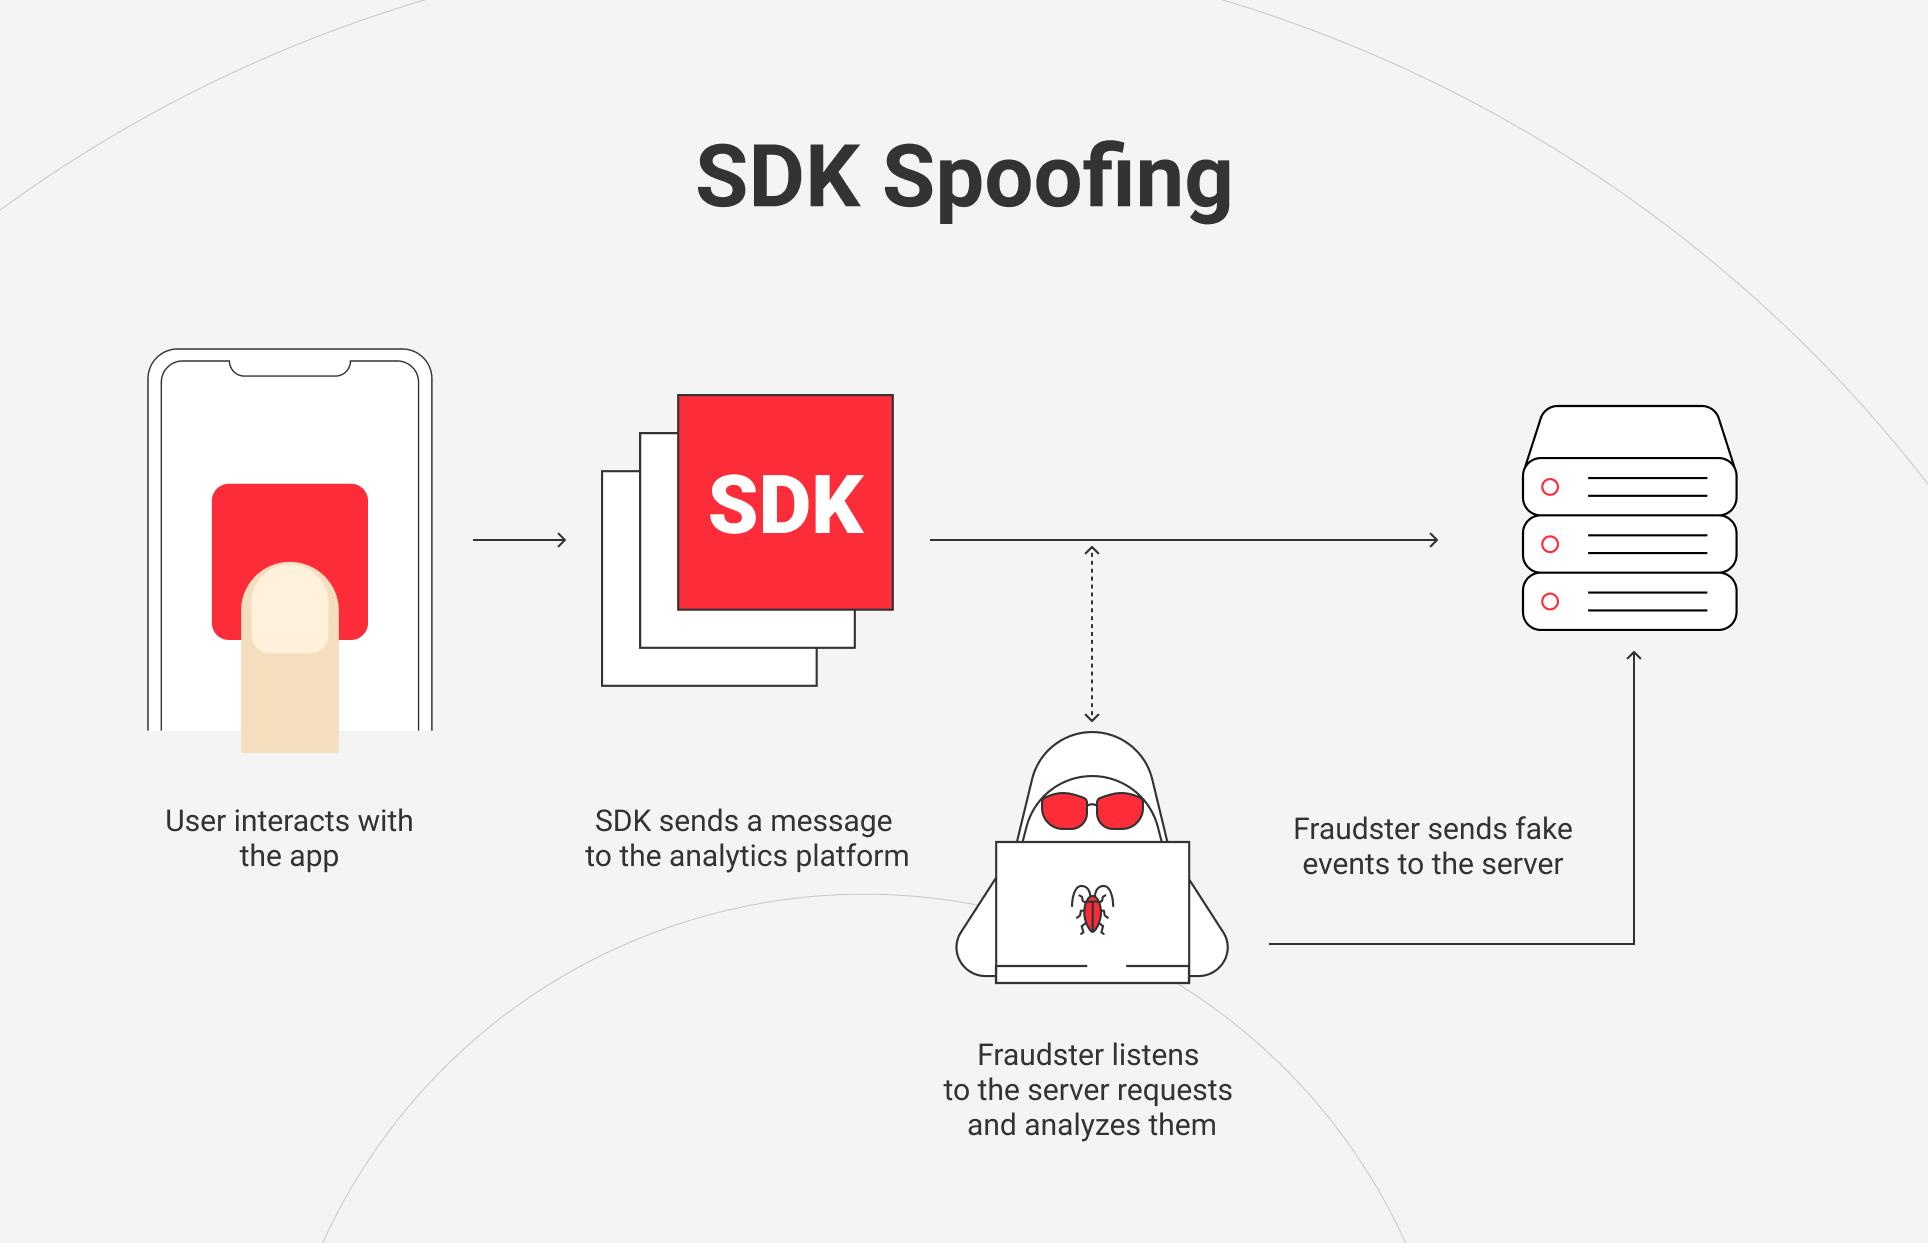 SDK spoofing